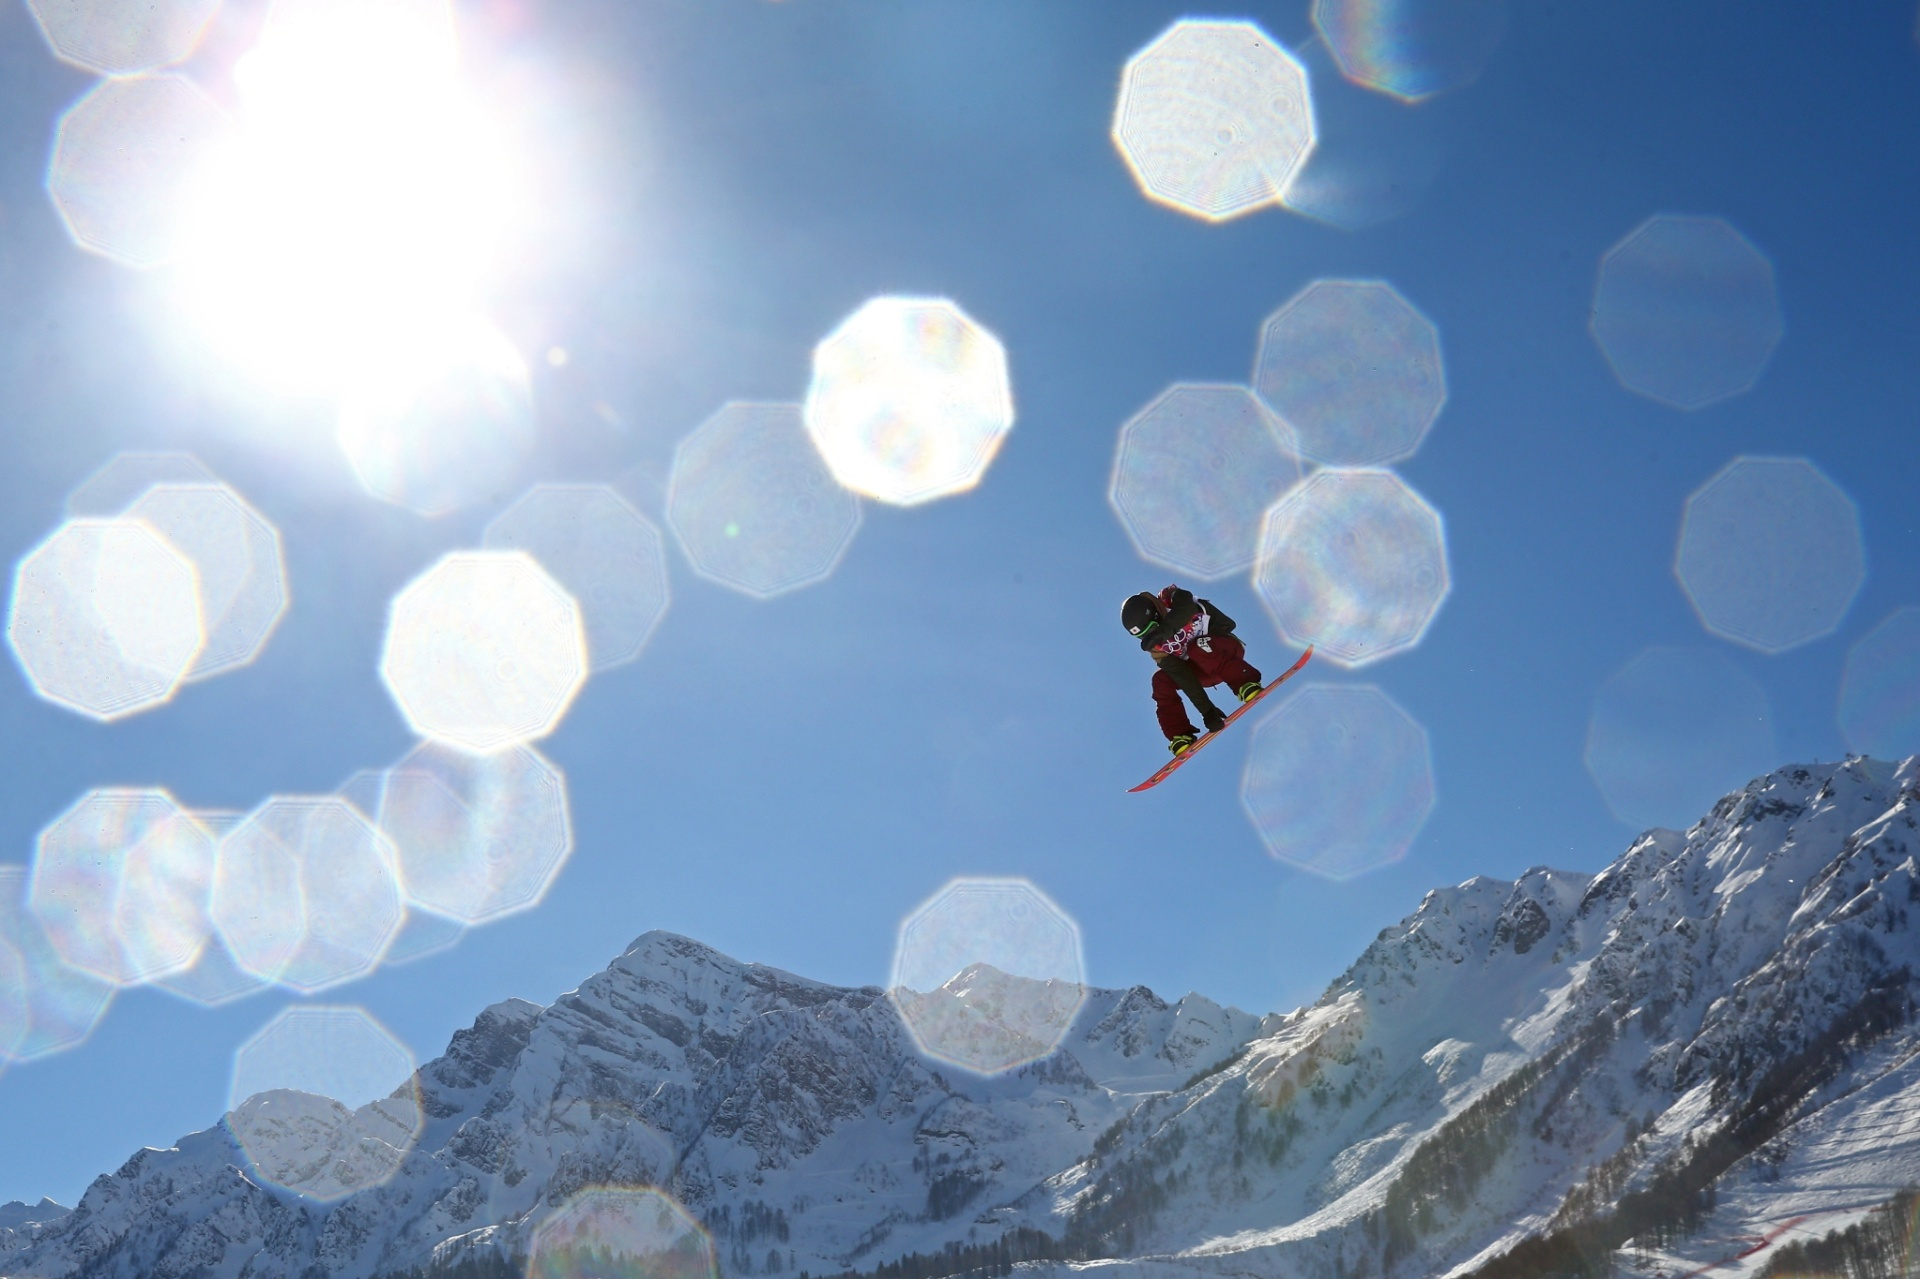 09.02.2014 - Sol cria belo efeito sobre o japonês Yuki Kadono, do snowboard slopestyle